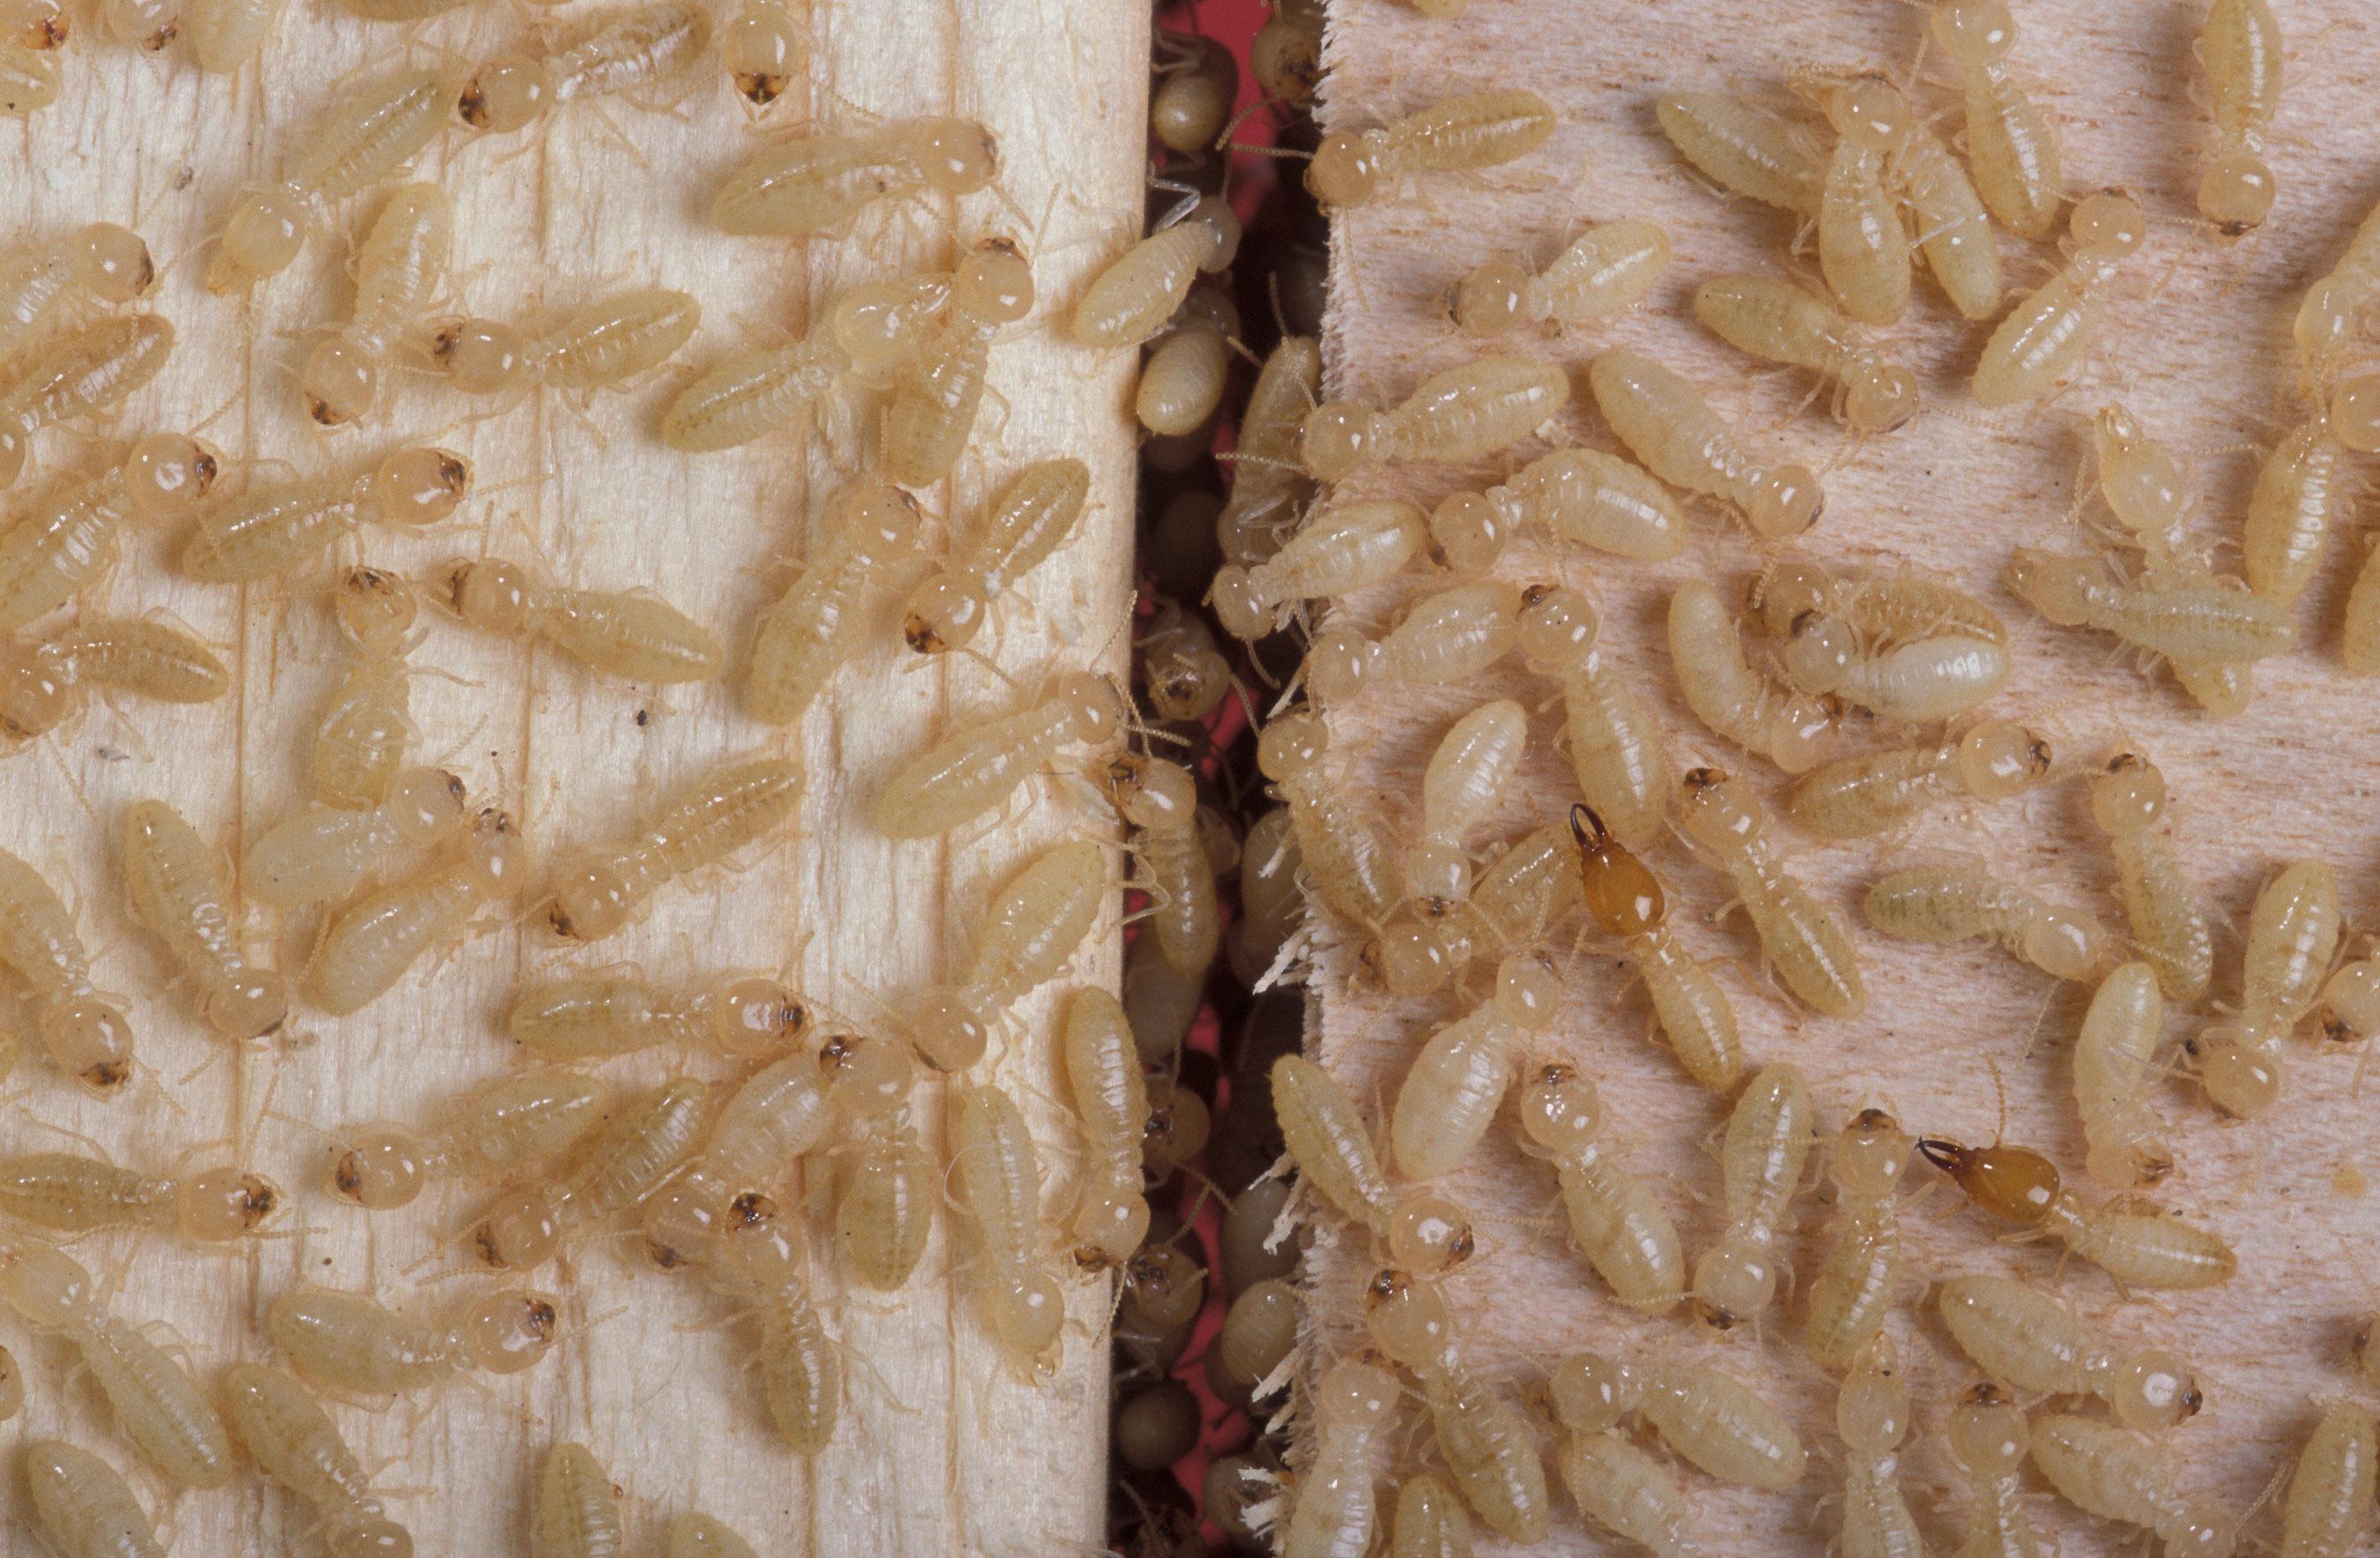 Above All Termite & Pest Control image 3